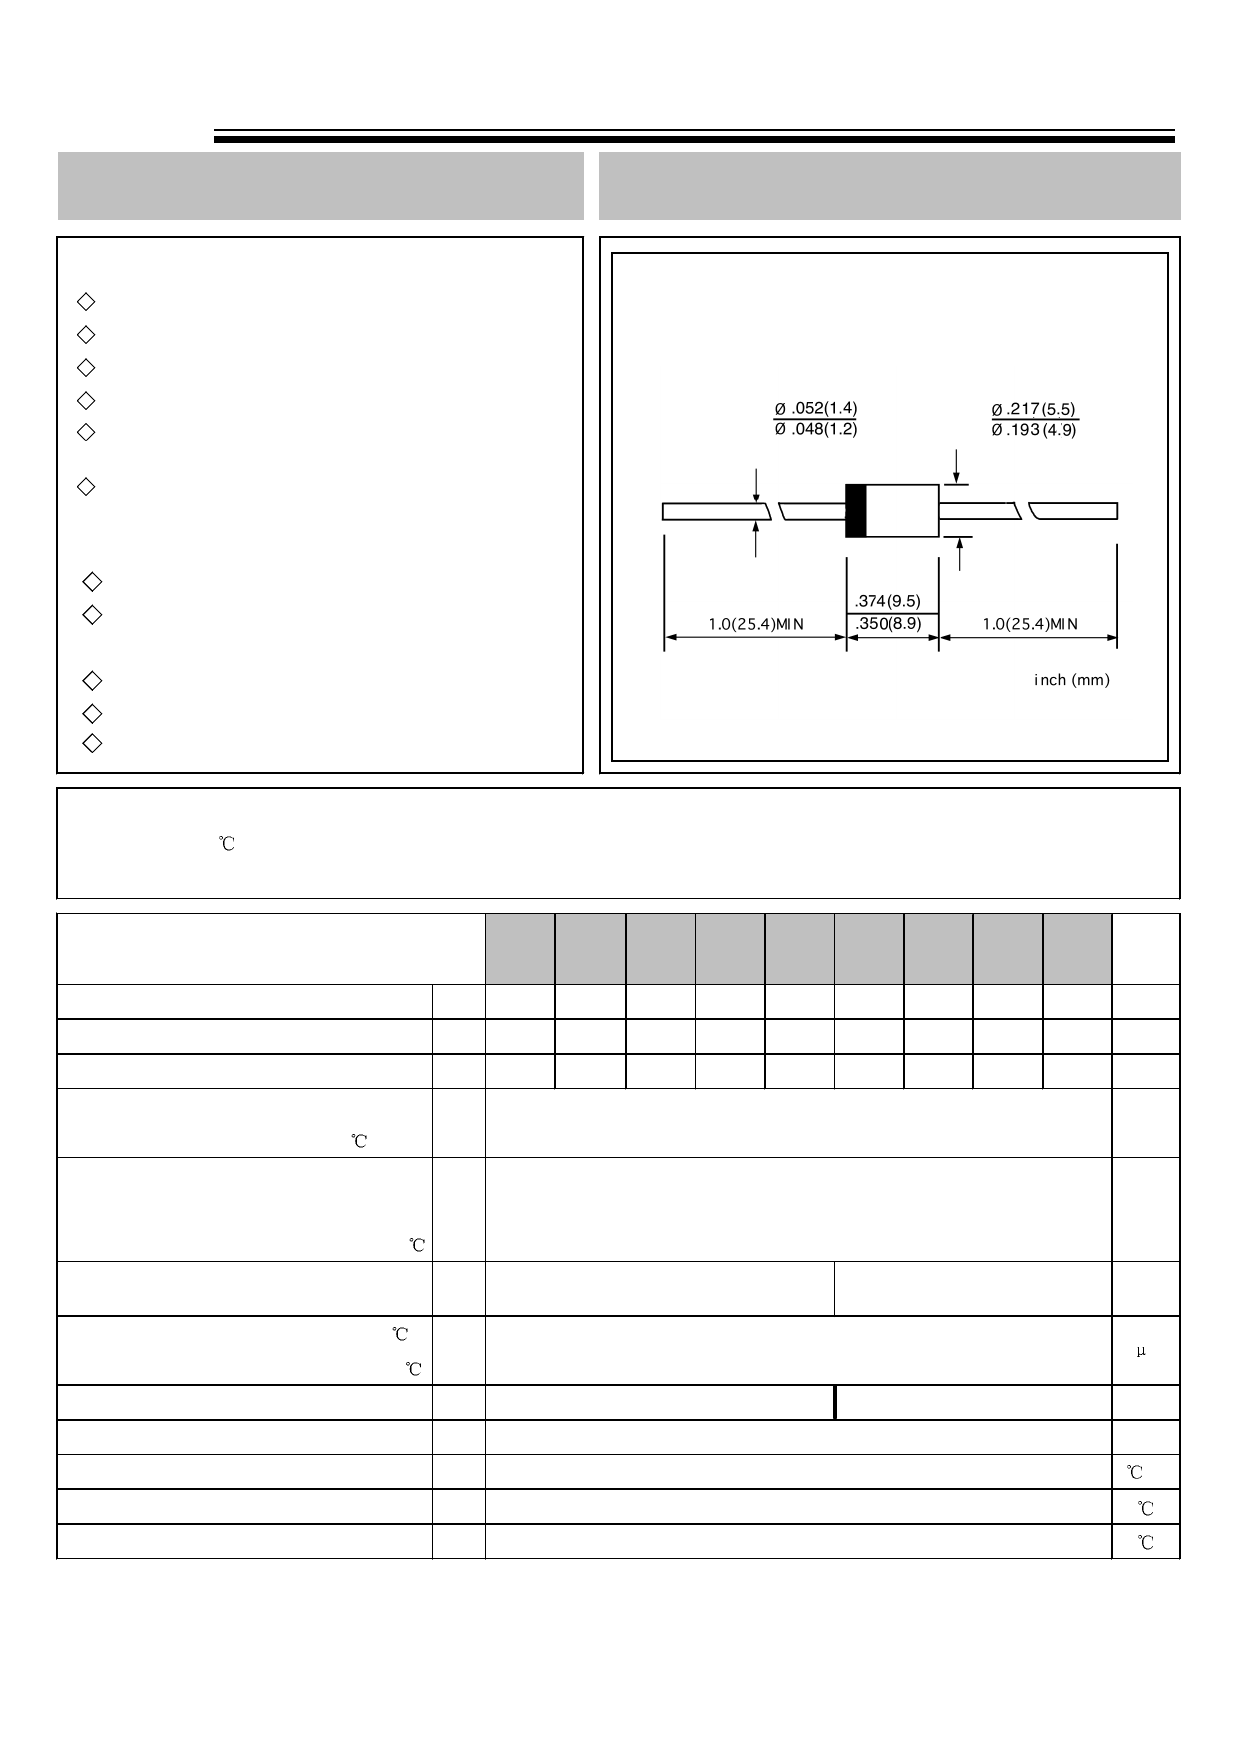 UF5400G datasheet